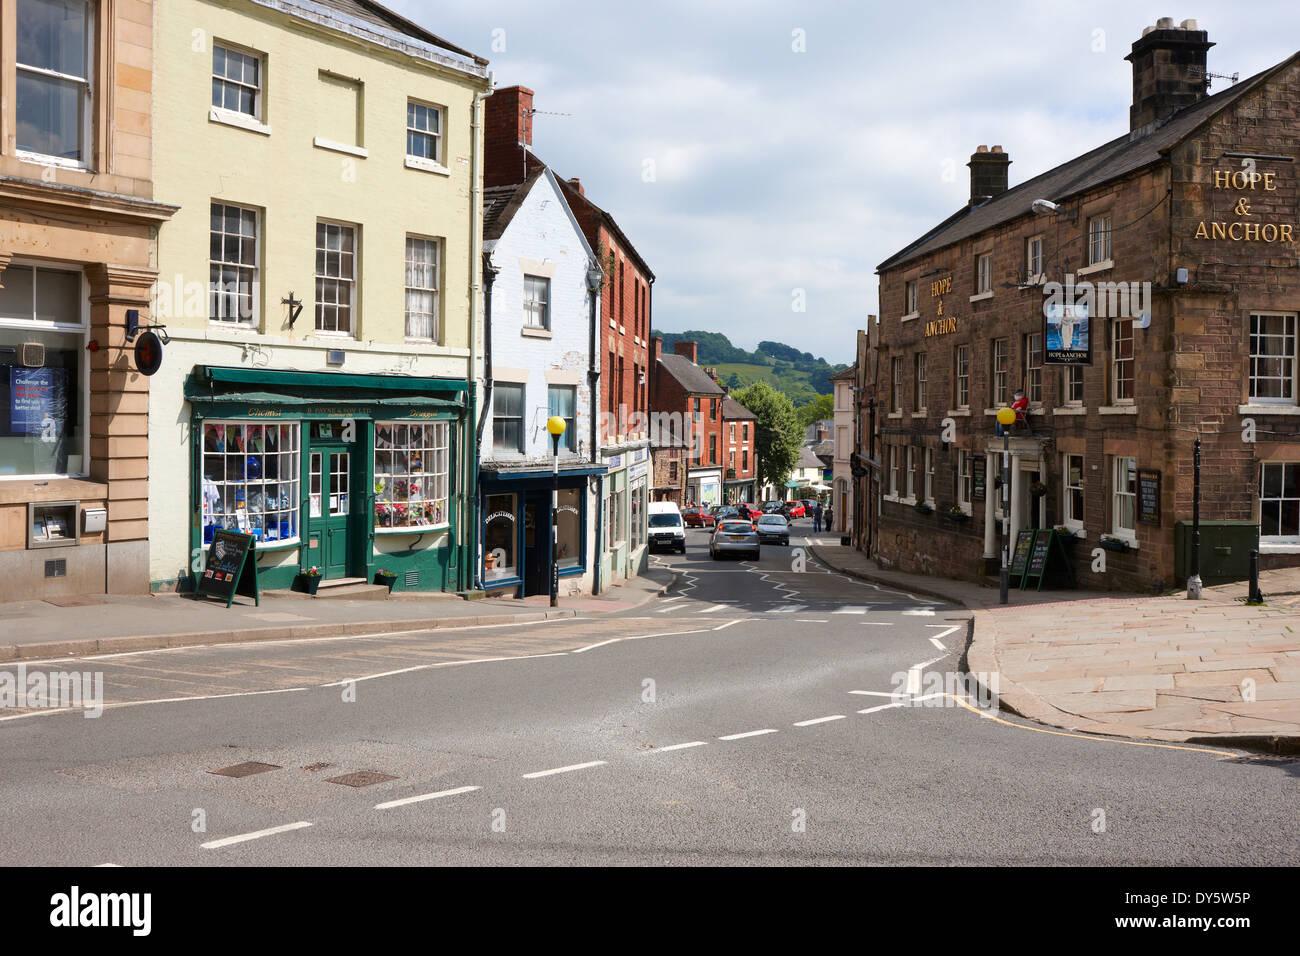 St John's Street in Wirksworth town centre, Derbyshire UK - Stock Image